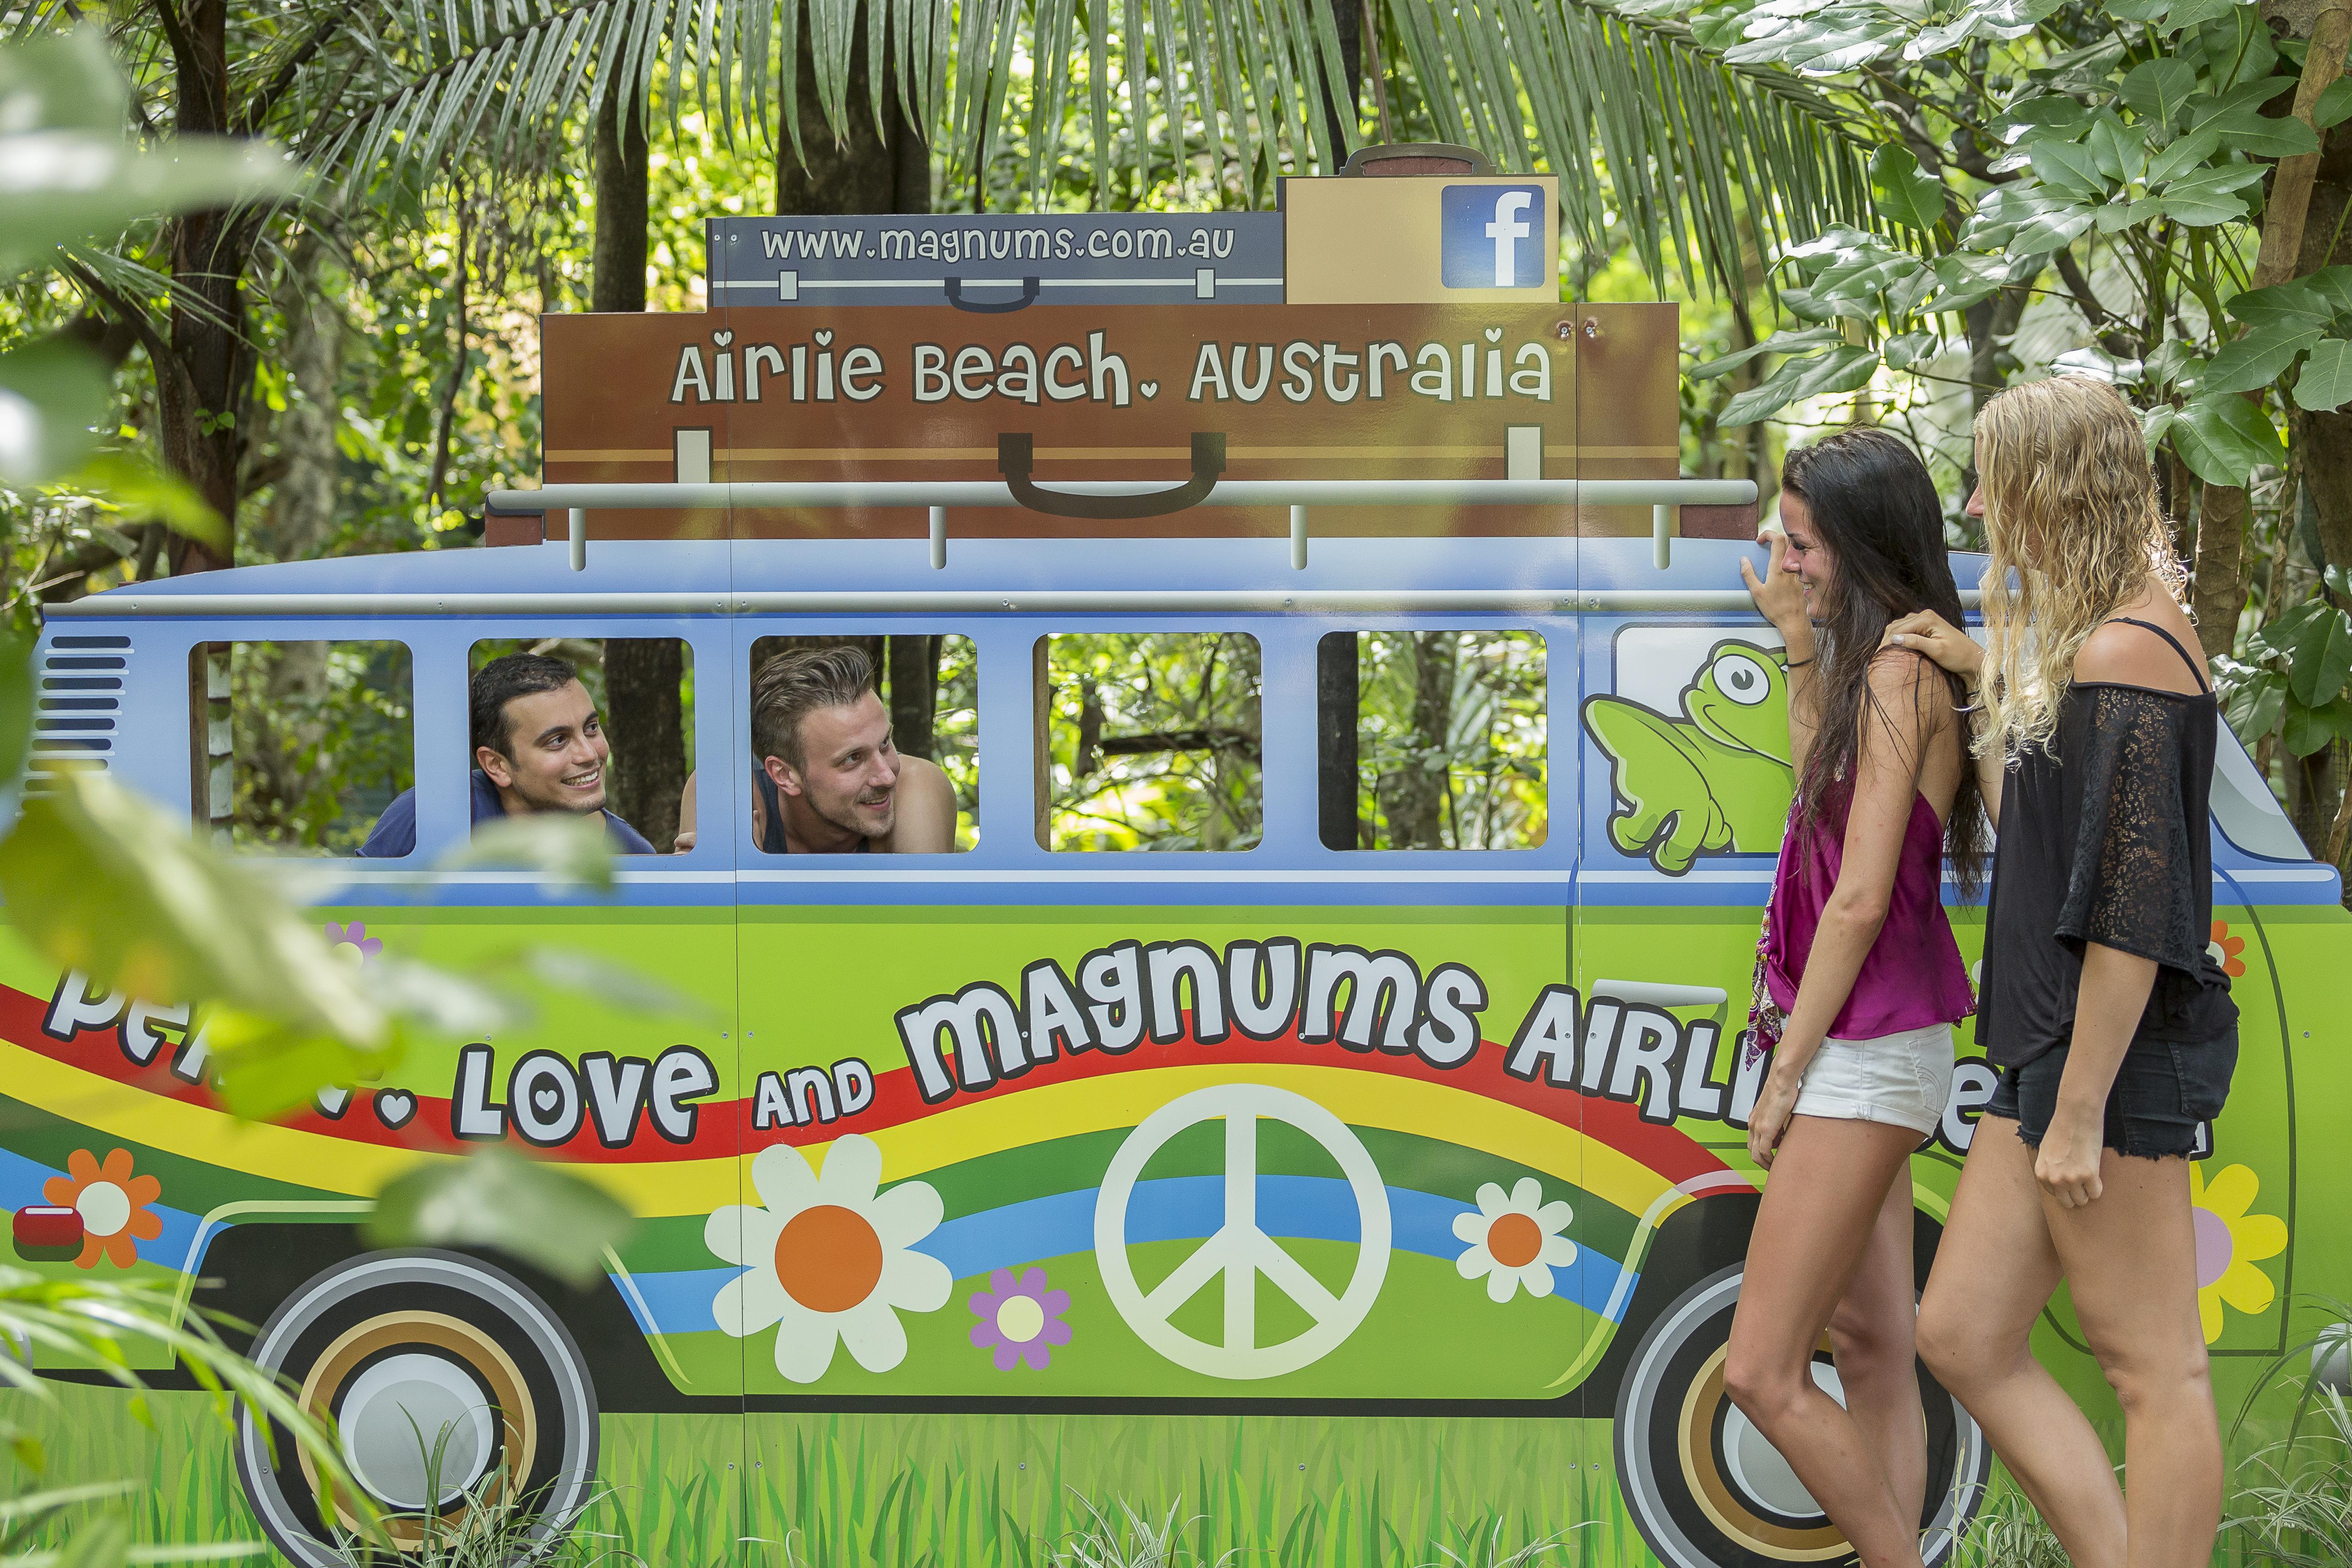 Airlie Beach Magnums